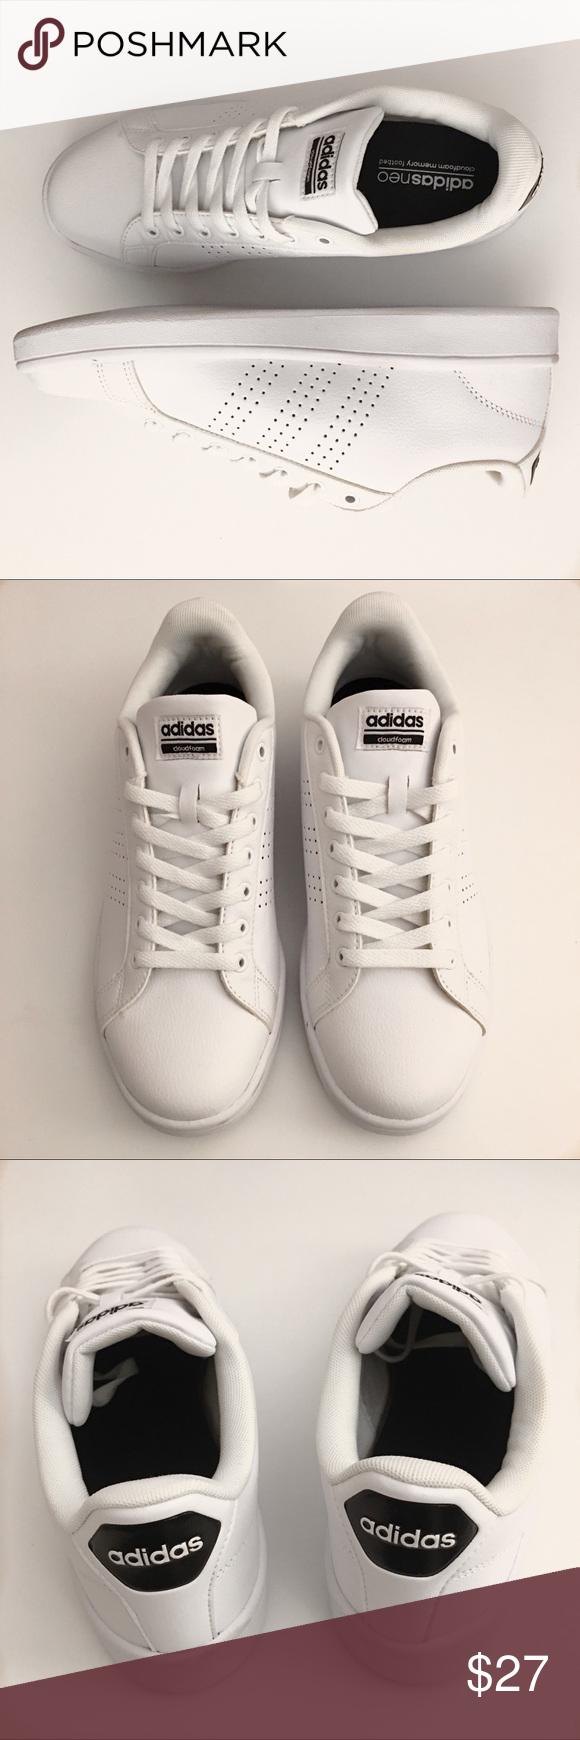 Adidas Neo Con Cloudfoam Memoria Footbed Memory Foam, Adidas E